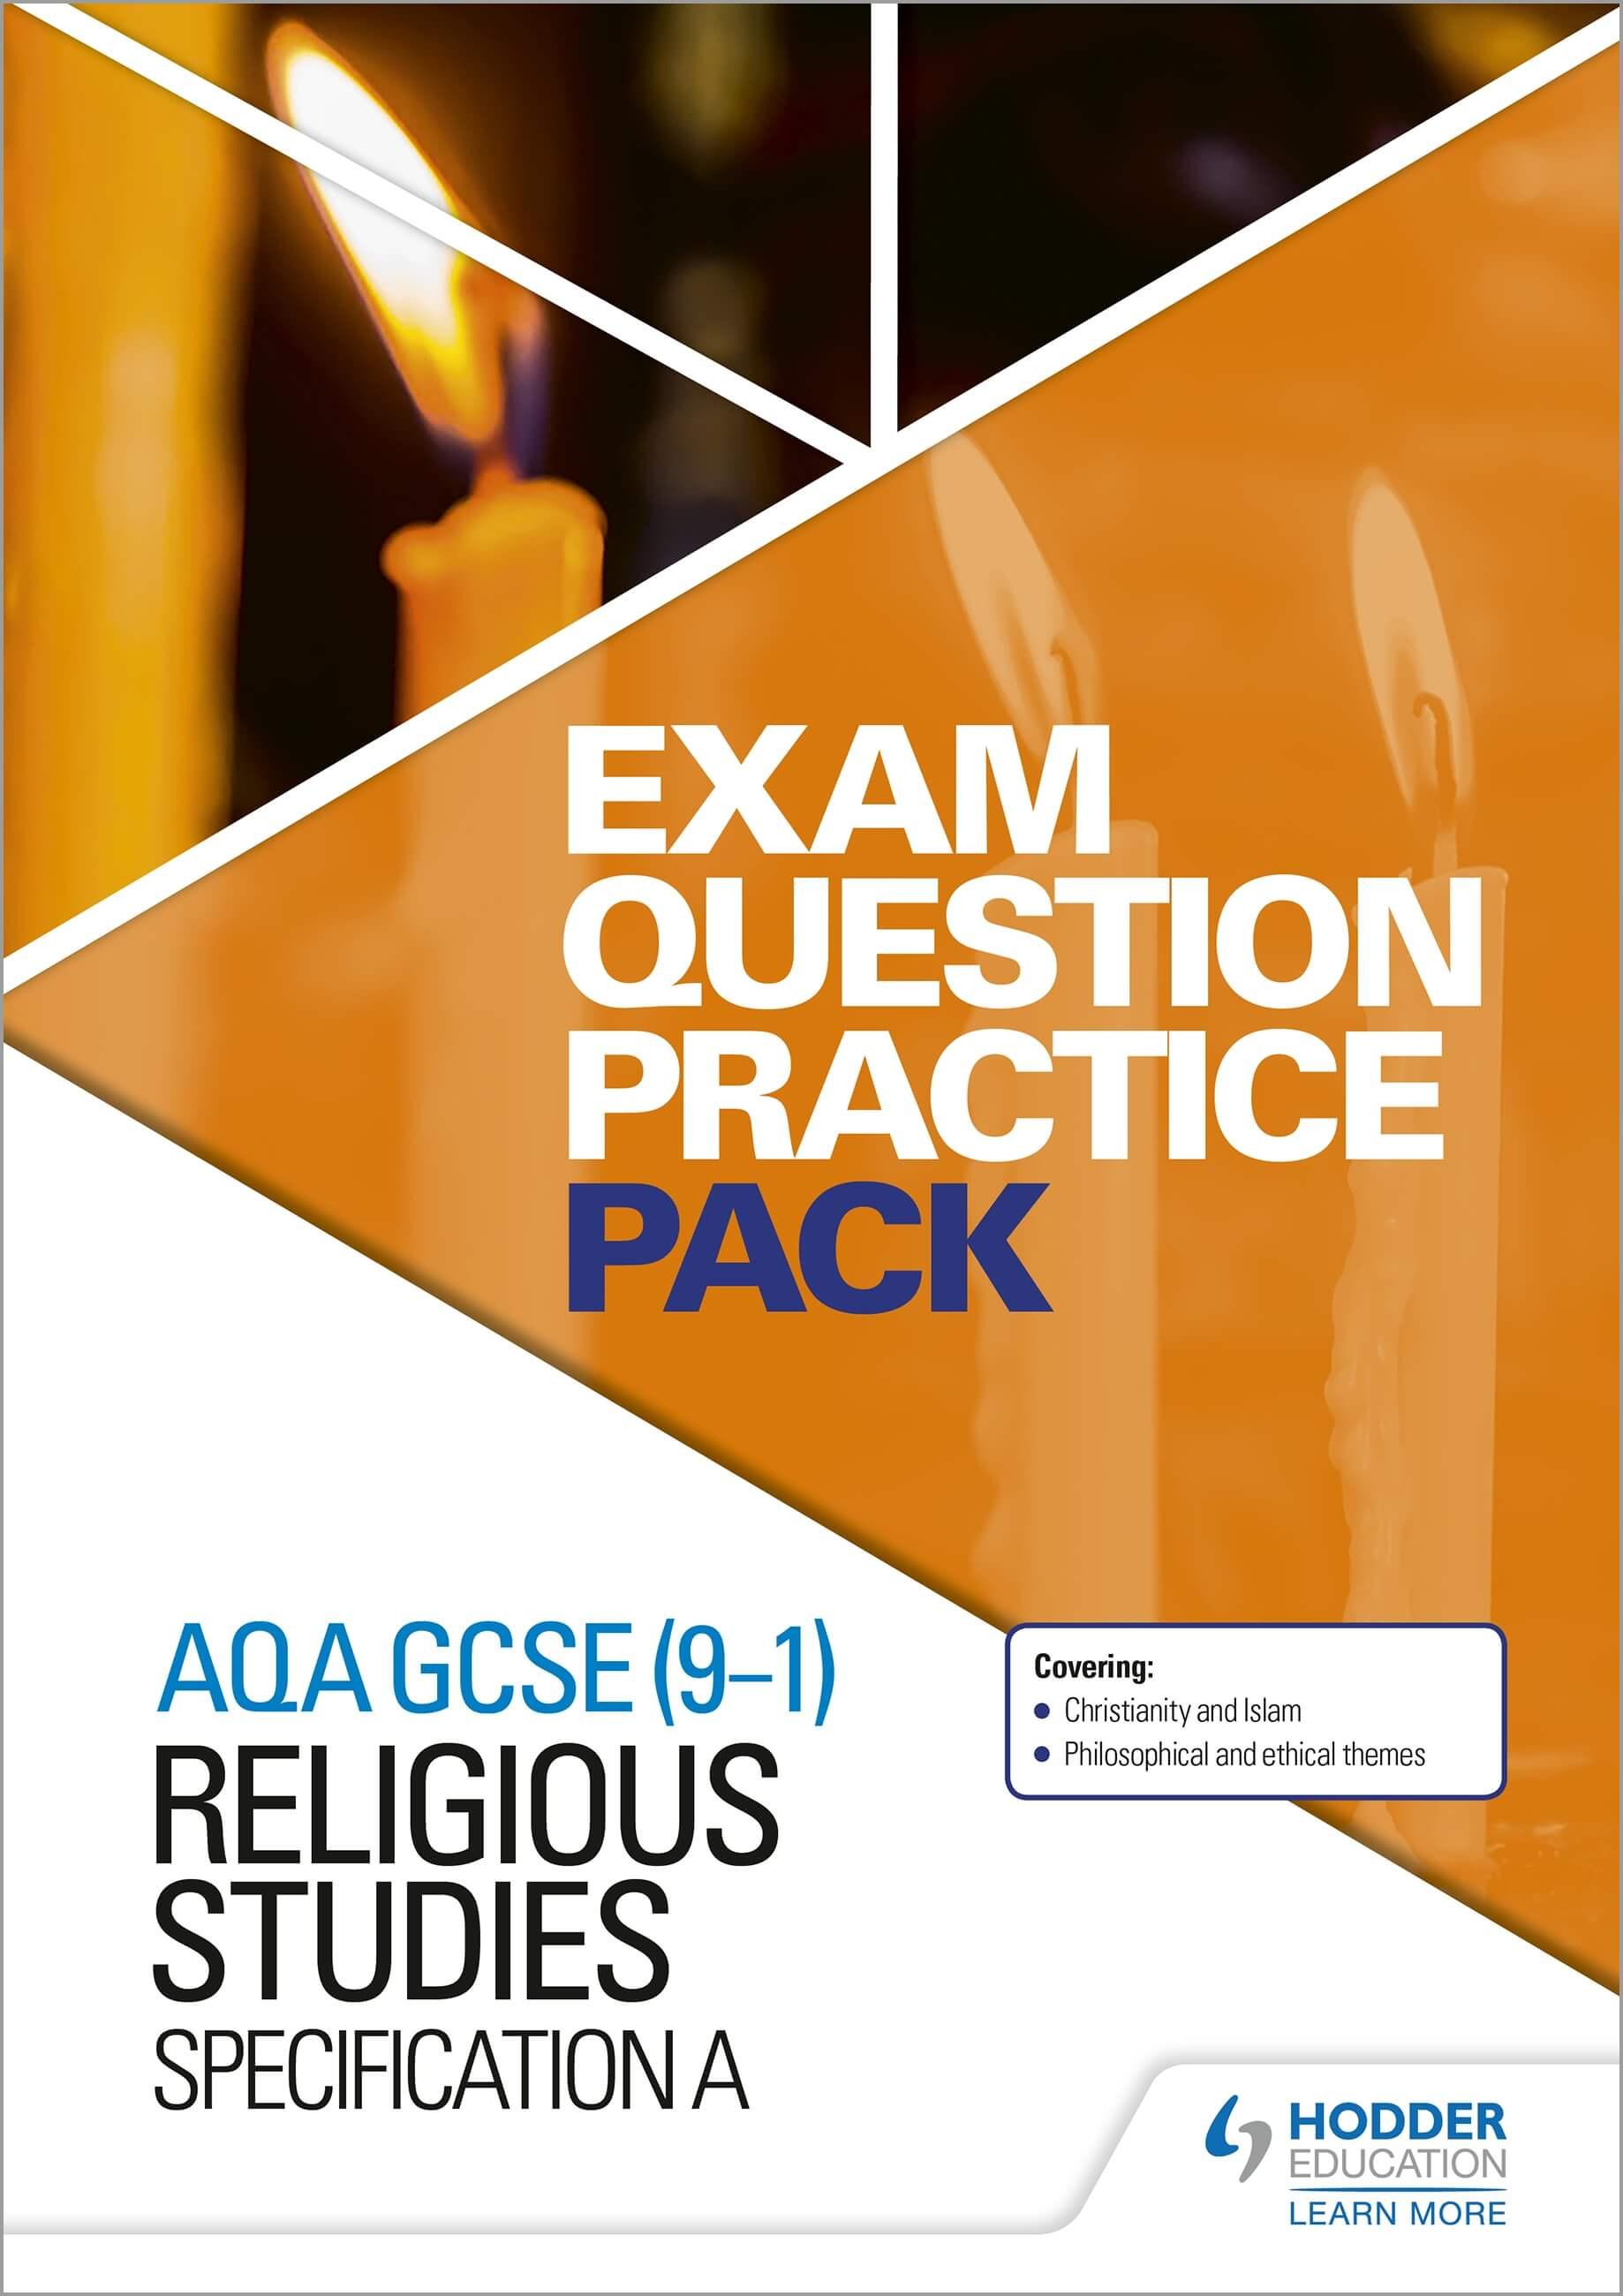 AQA GCSE (9-1) Religious Studies A: Exam Question Practice Pack